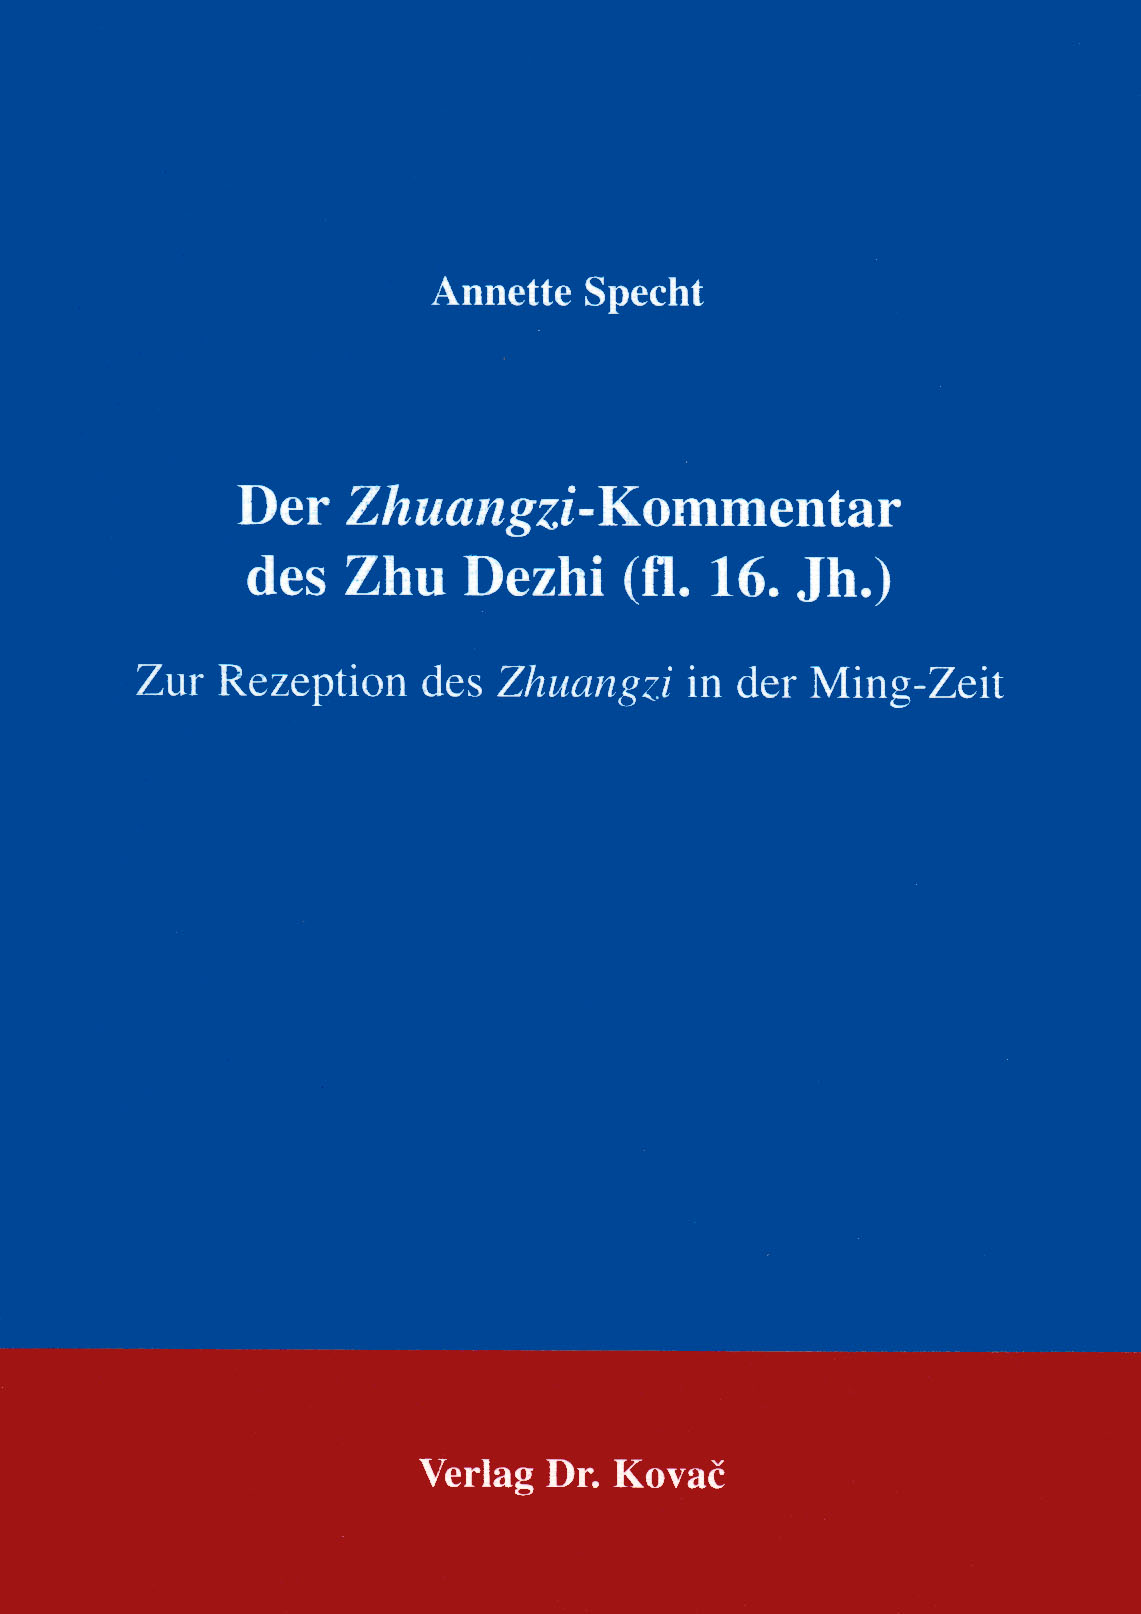 Cover: Der Zhuangzi-Kommentar des Zhu Dezhi (fl. 16. Jh.)